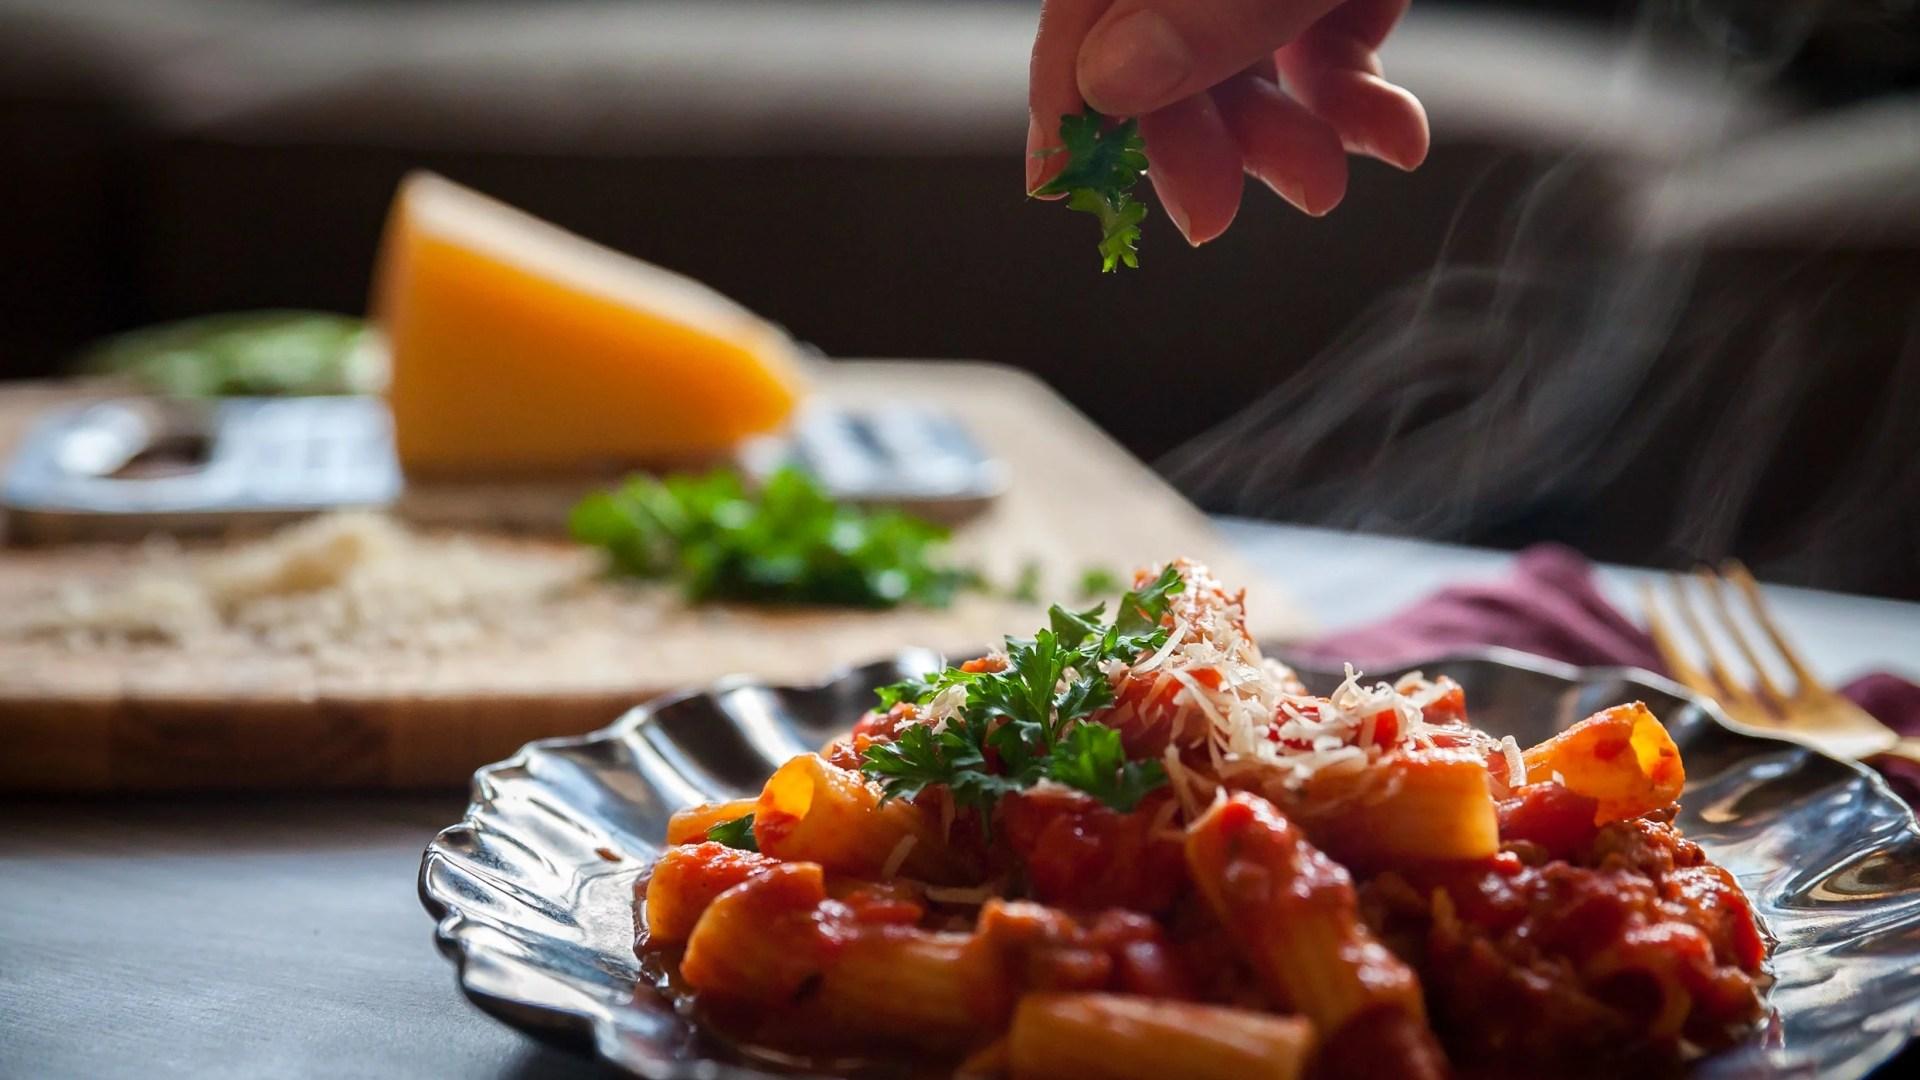 Dinner with Ballo Italian: Rigatoni with Spicy Sausage Ragu